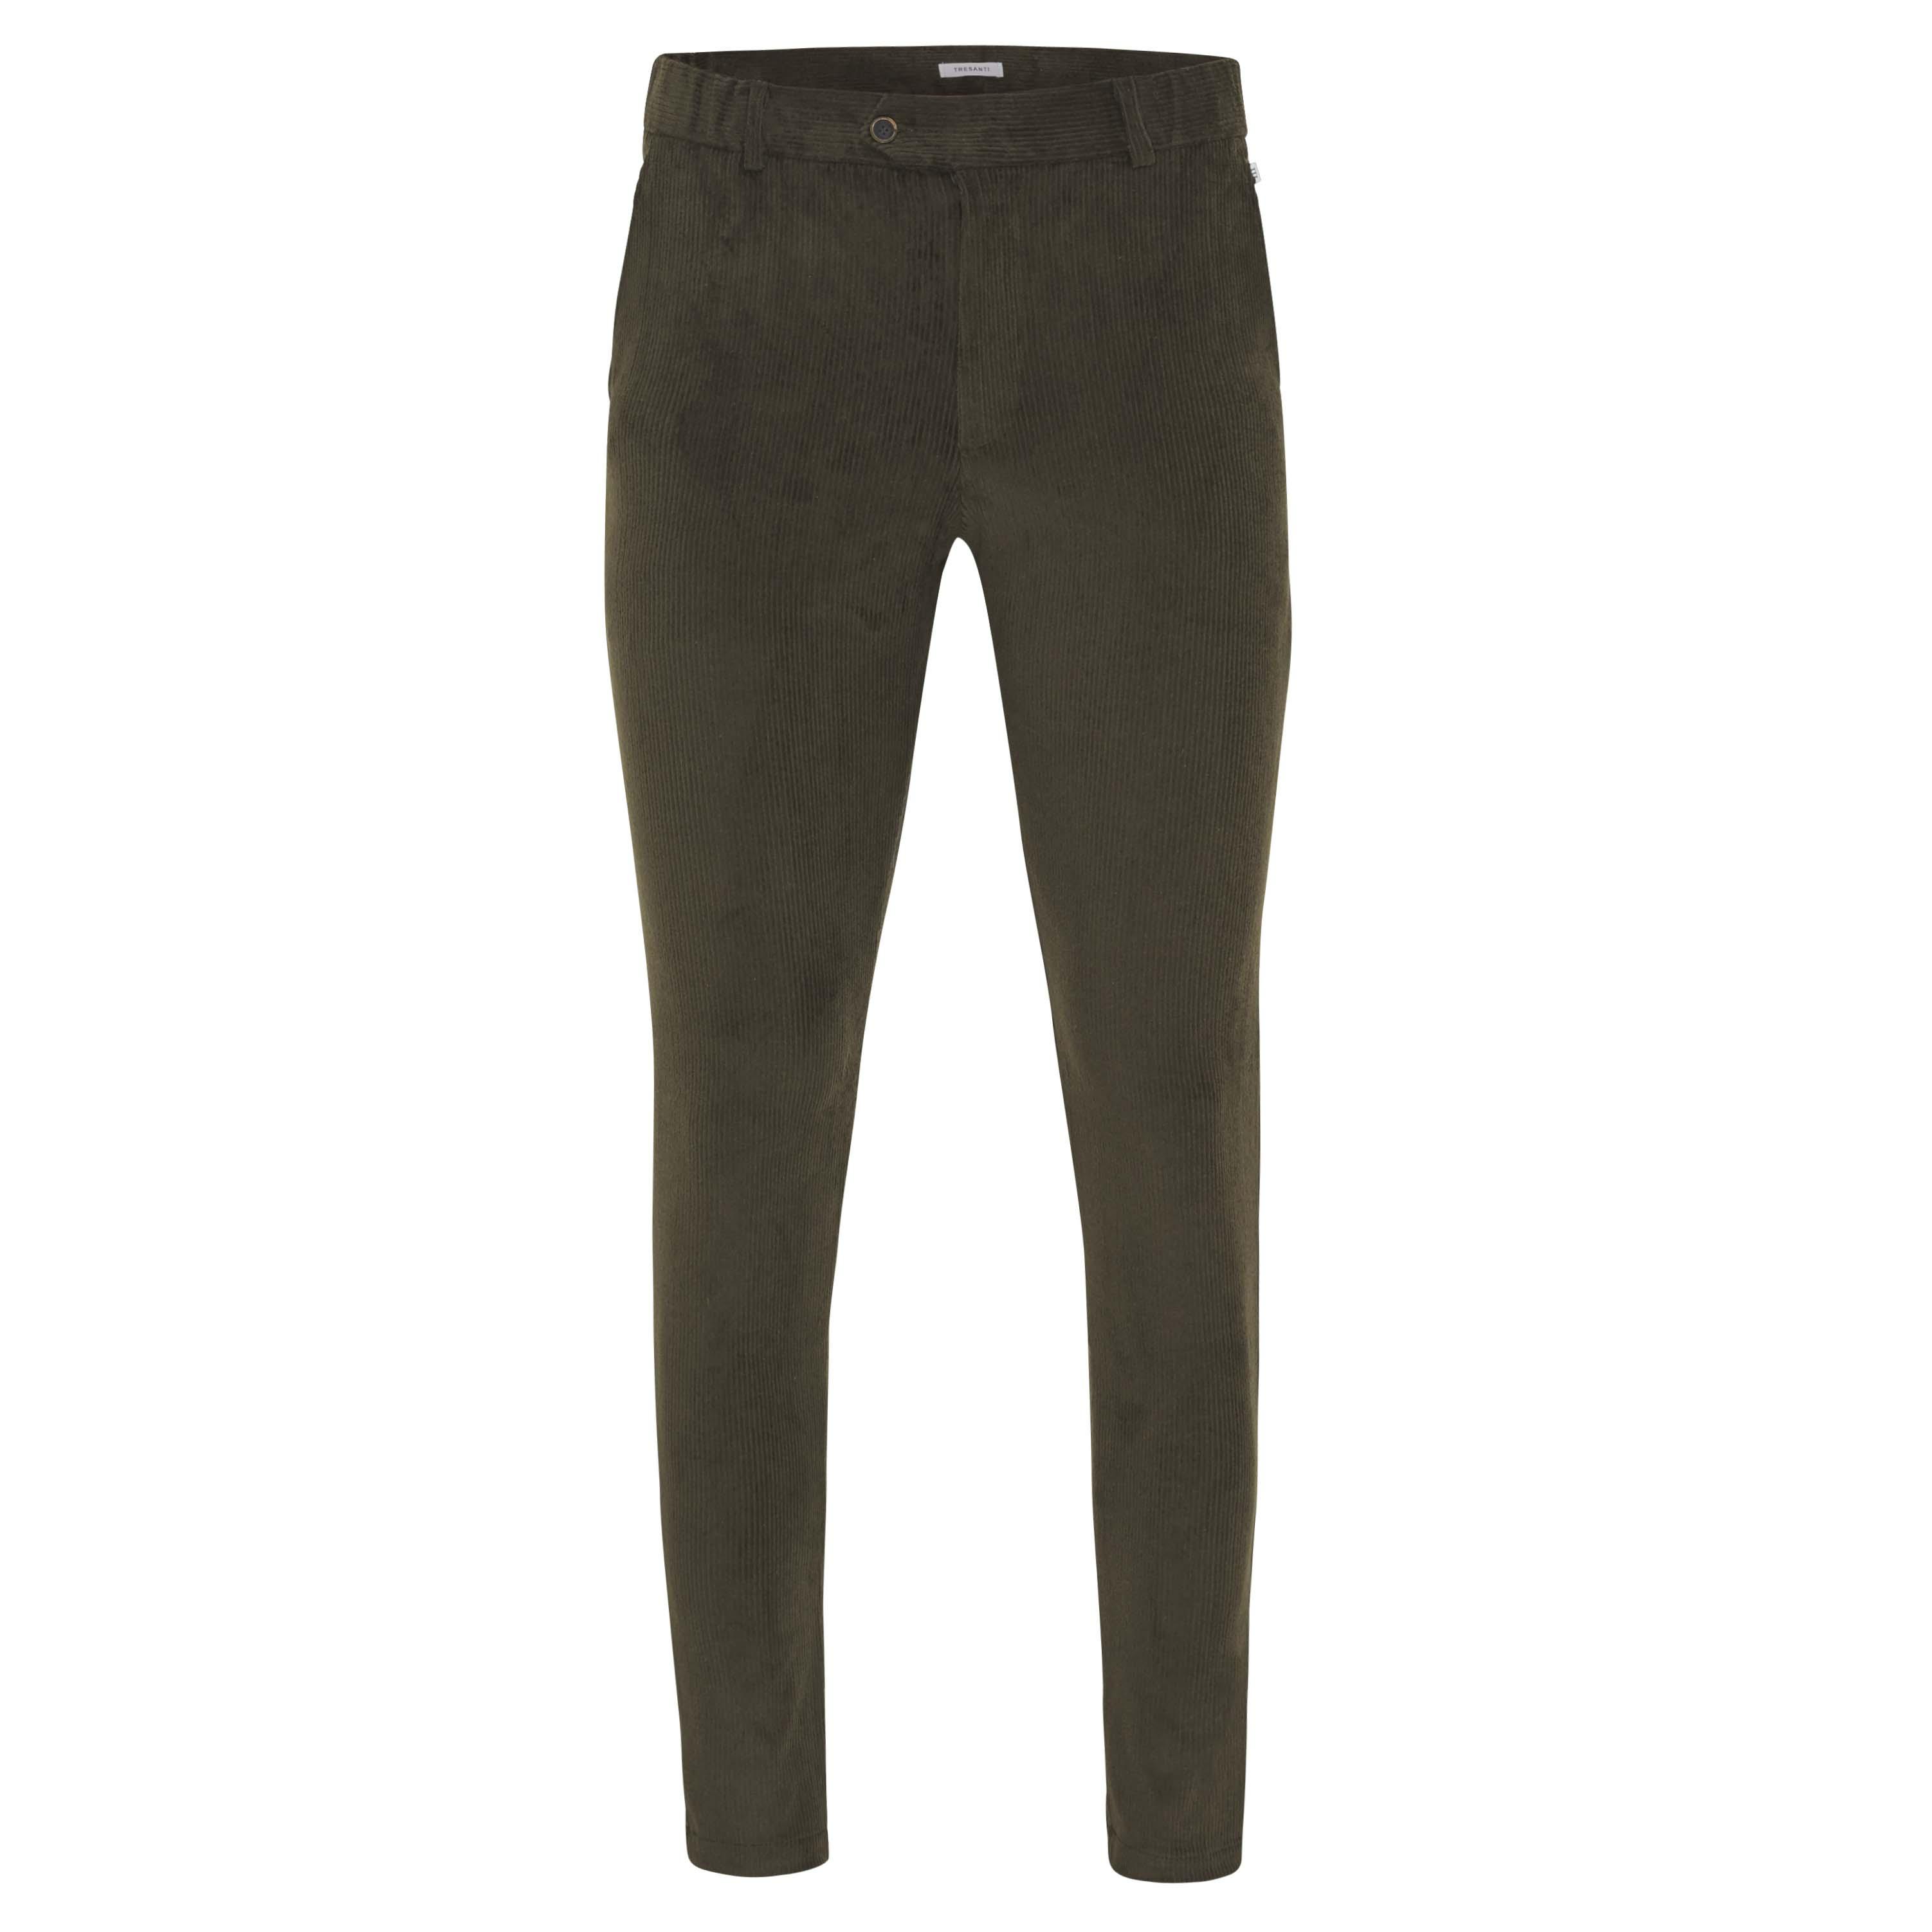 Jackson | Trousers stretch corduroy green